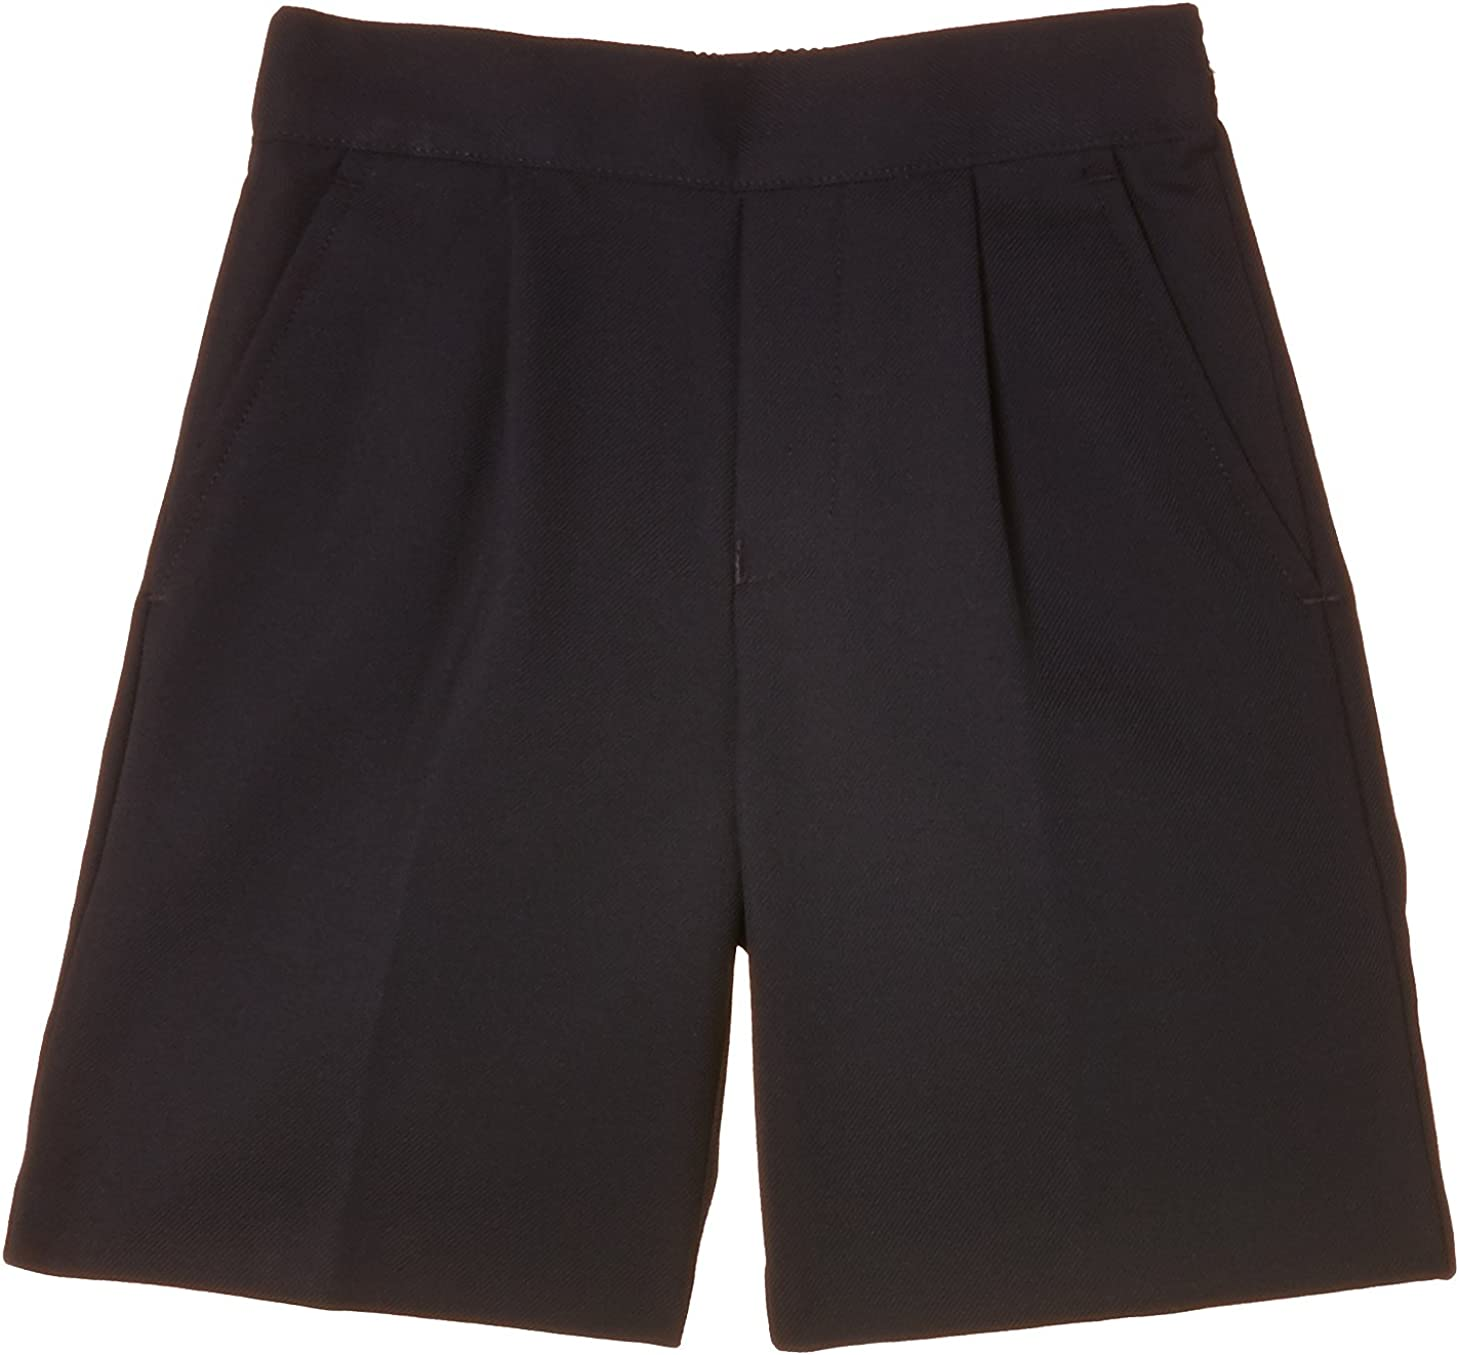 Trutex Limited Boys Plain Bermuda Plain Shorts